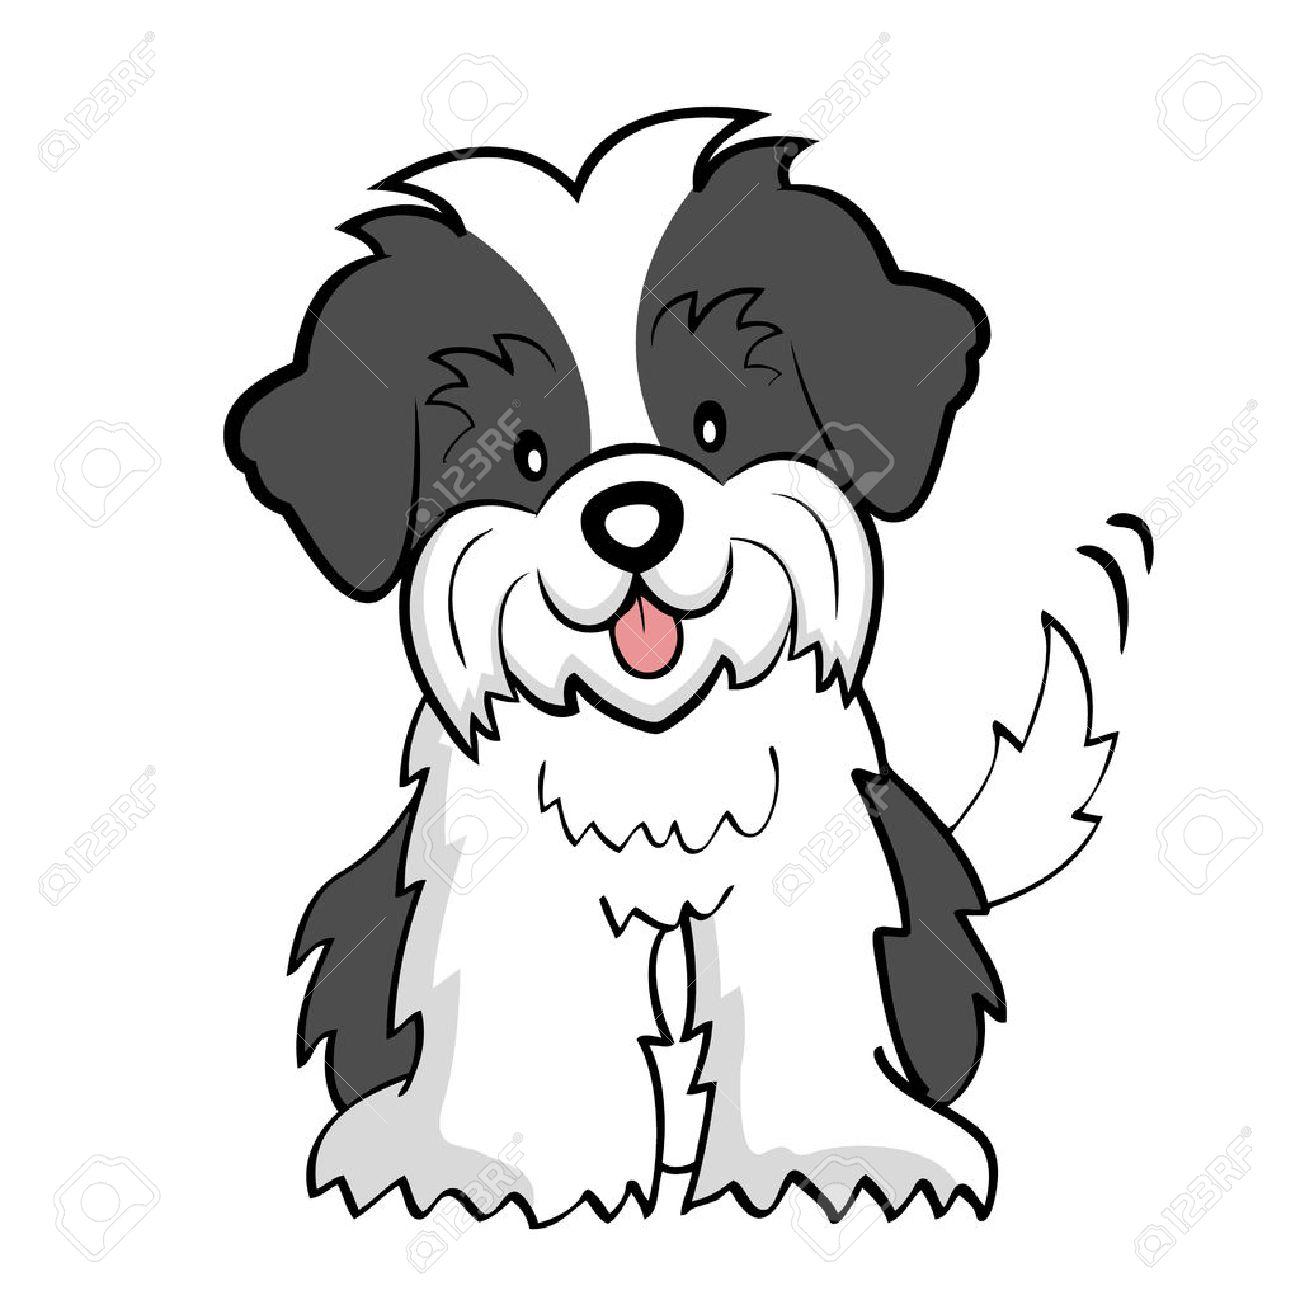 Puppy cut Shih tzu isolated.